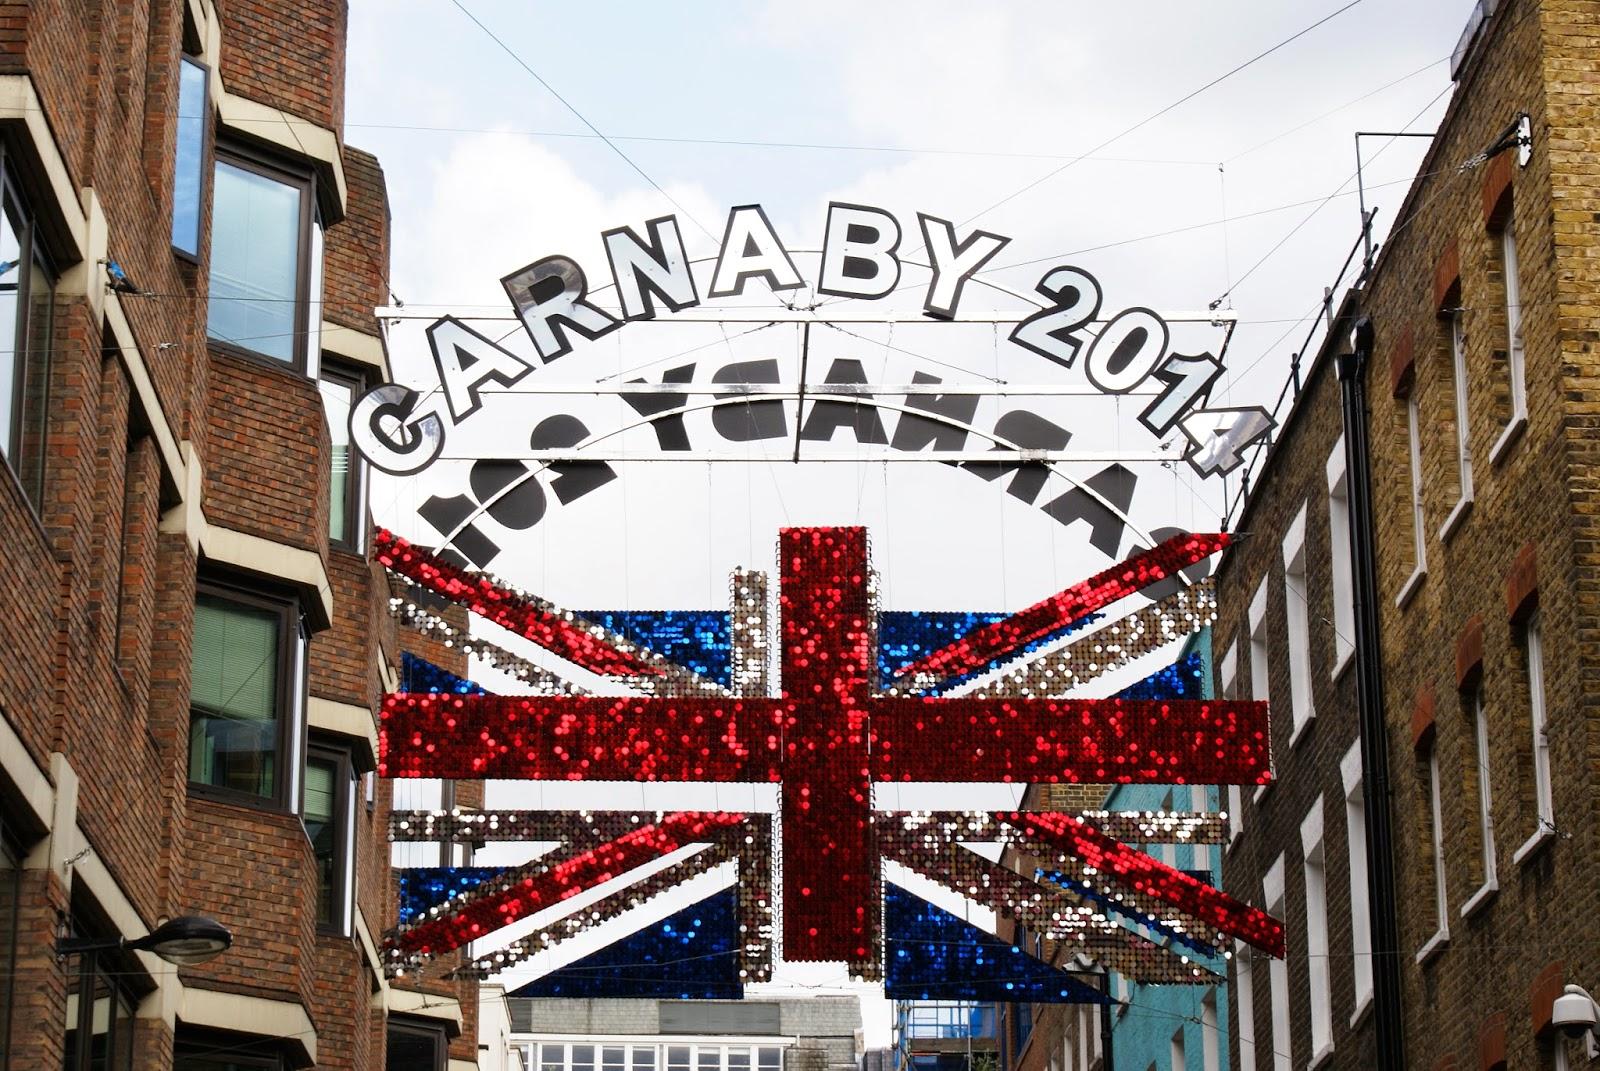 carnaby street soho london uk england britain